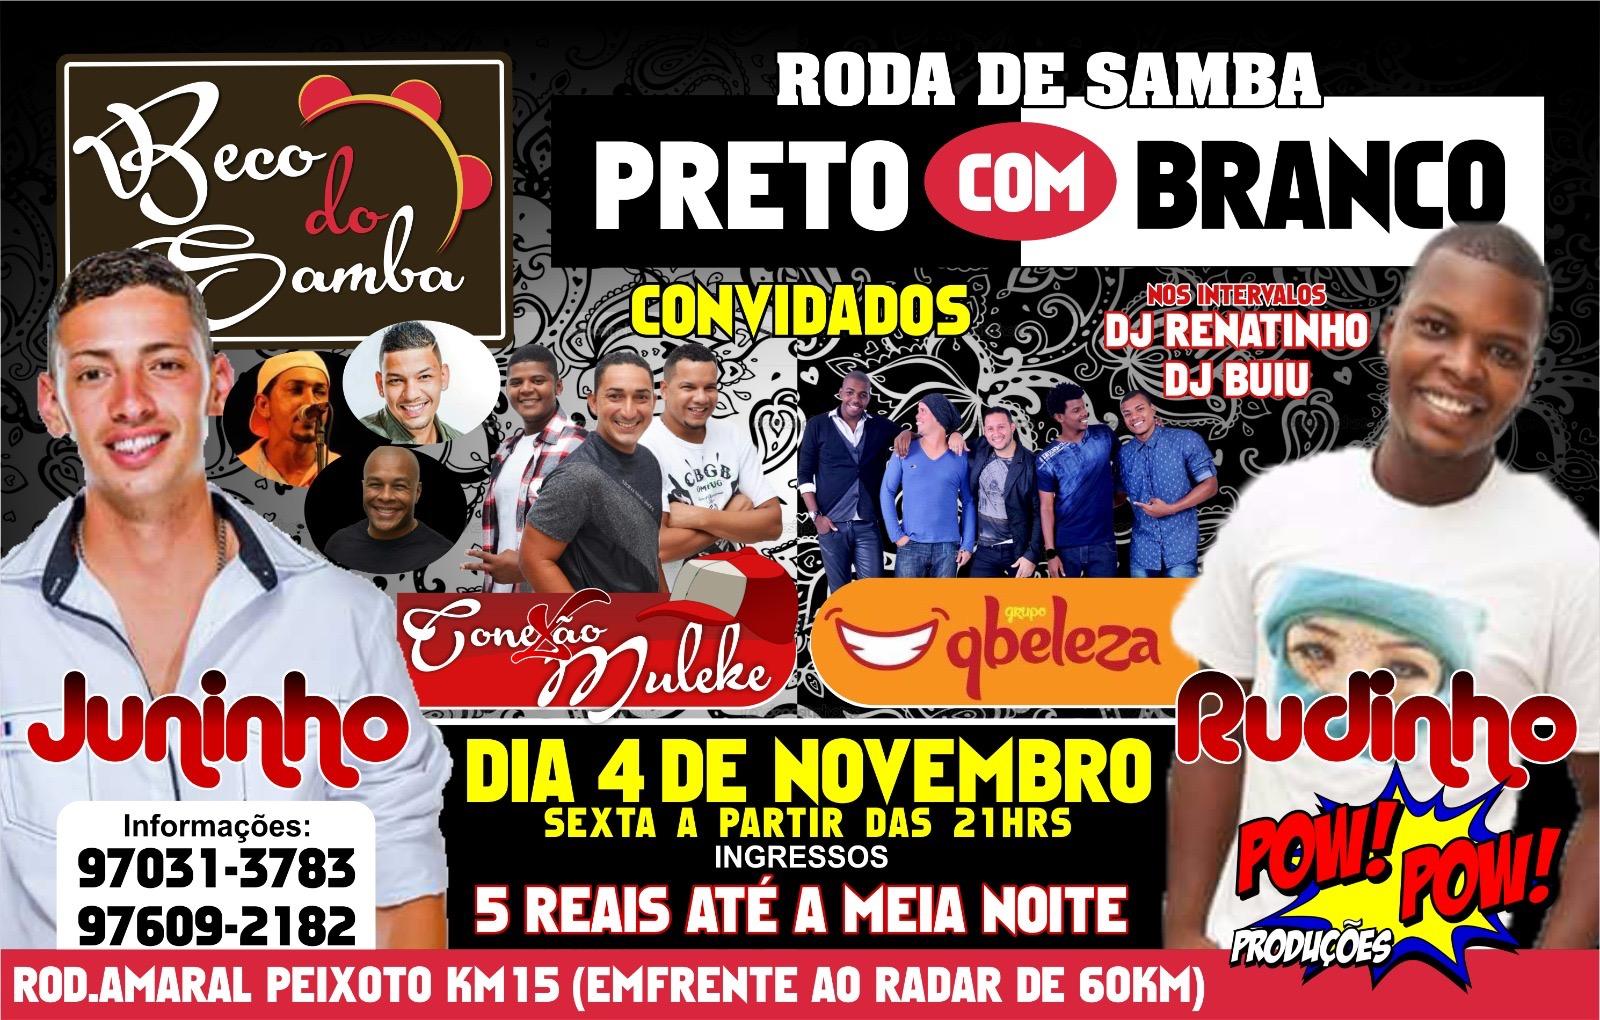 Maricá: Sexta-feira terá roda de samba em Inoã